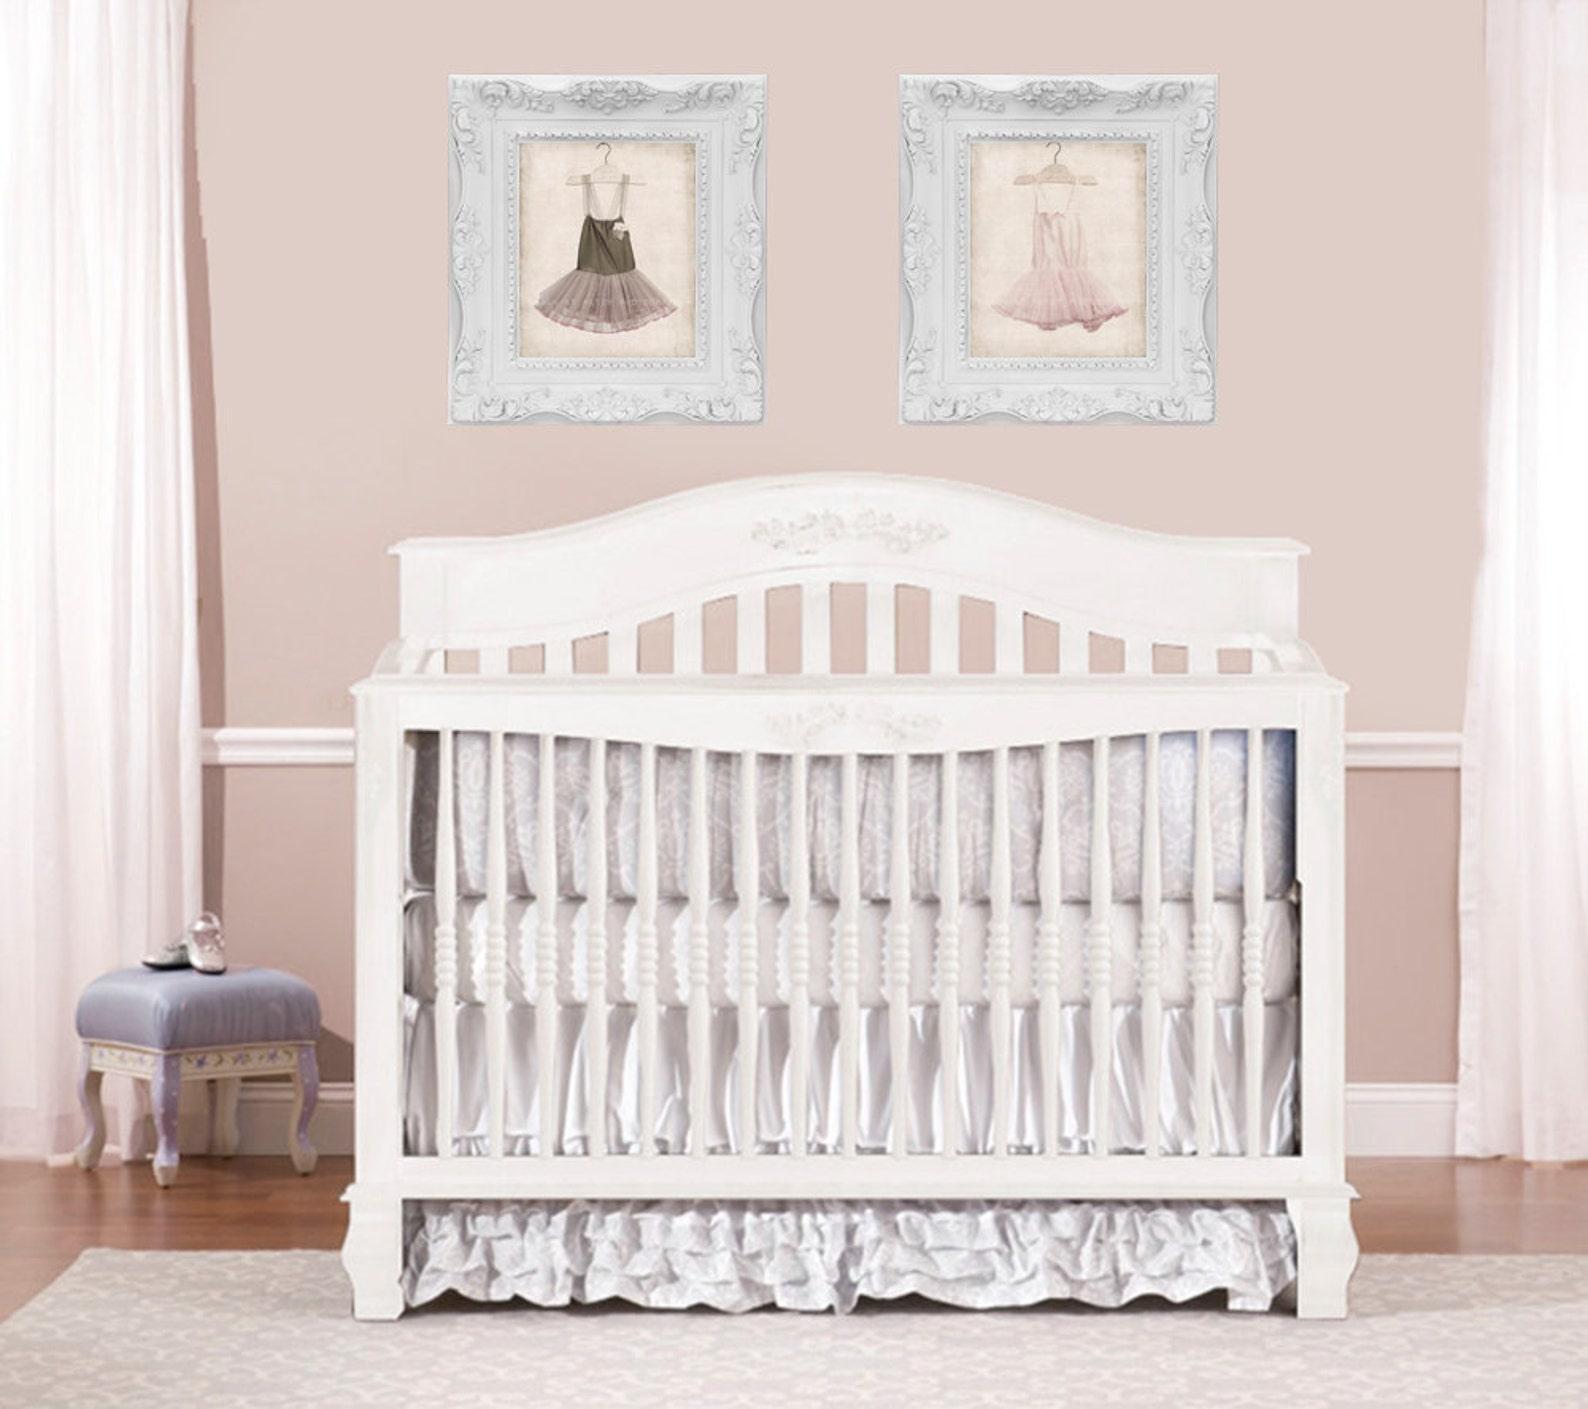 baby girl ballet tutu dress vertical, photo print, girls nursery decor, french decor ballerina girls room prints,